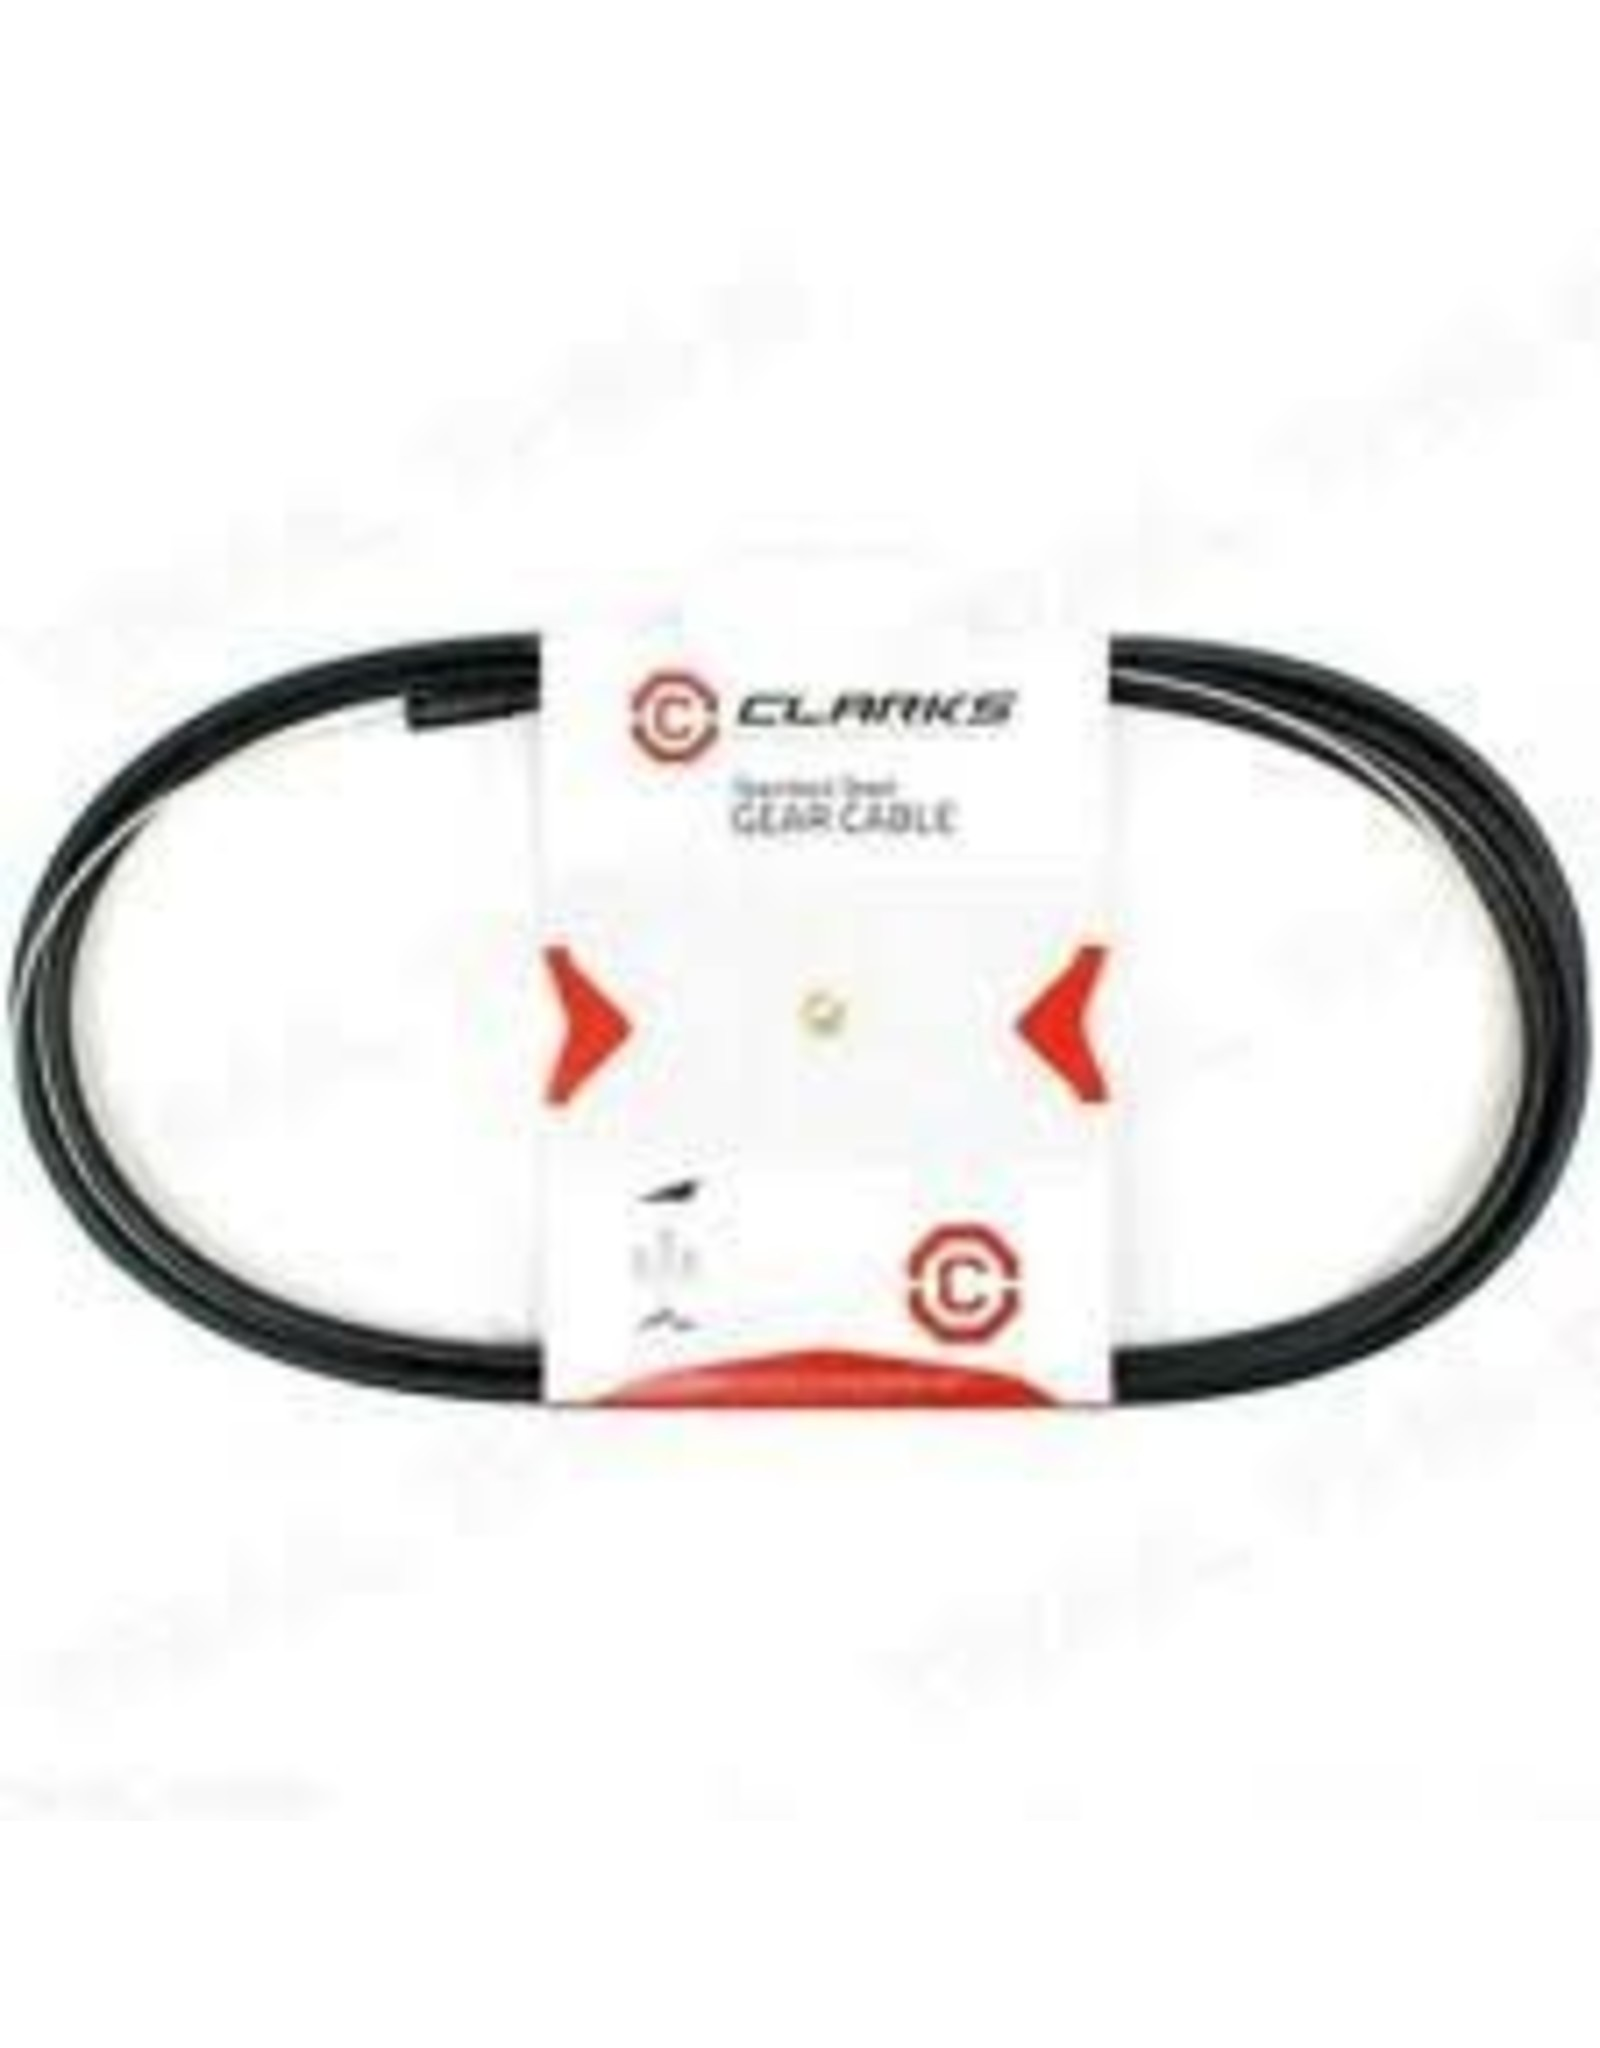 CLARKS Cable Kit Derailleur  SS w/Blk 4mm SIS Housing Clarks